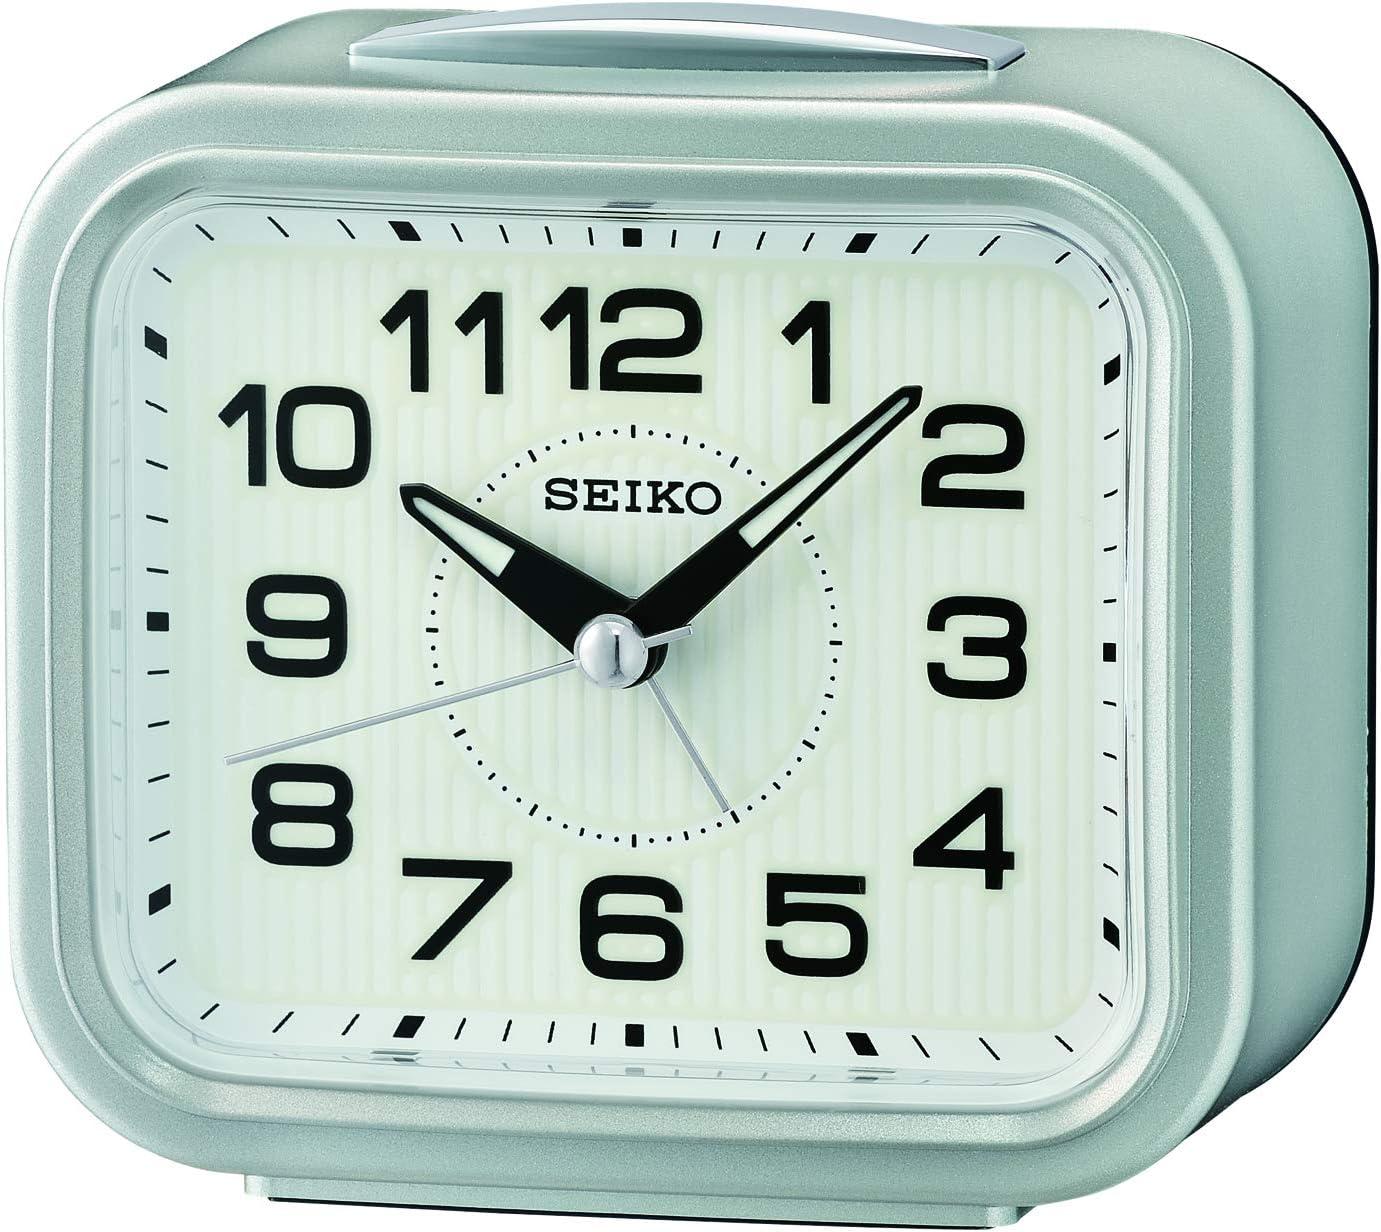 Seiko Alarm 激安セール Clock Silver 9.3 未使用品 5.4 cm 10.5 x